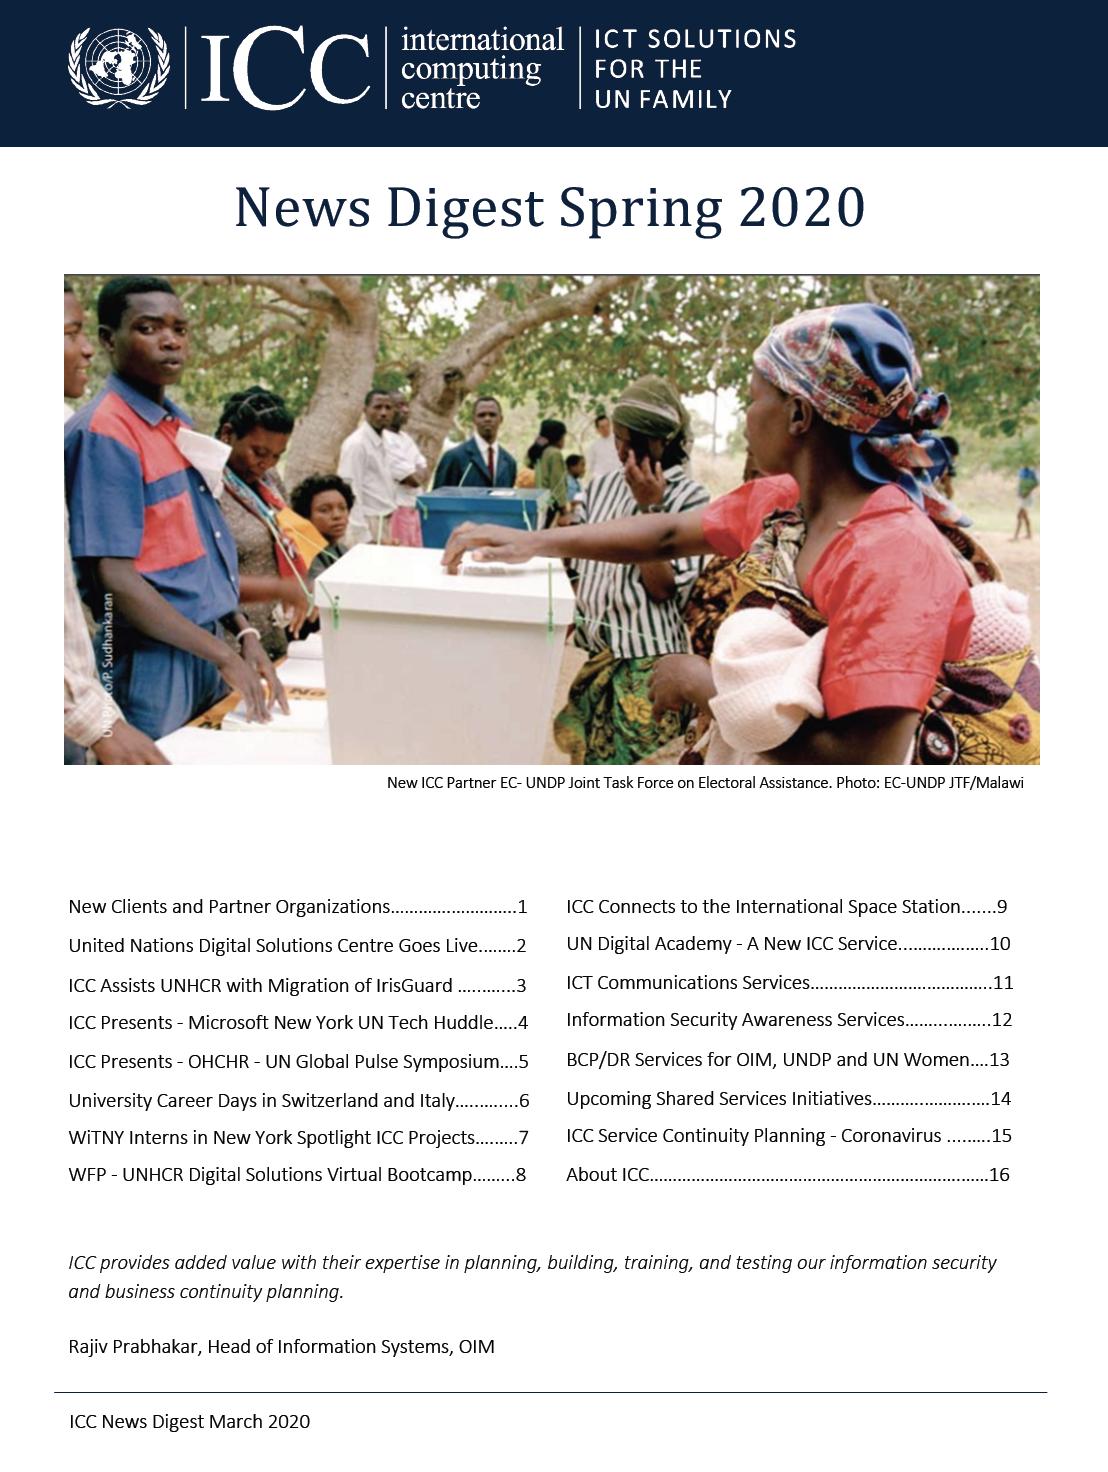 UNICC News Digest Spring 2020